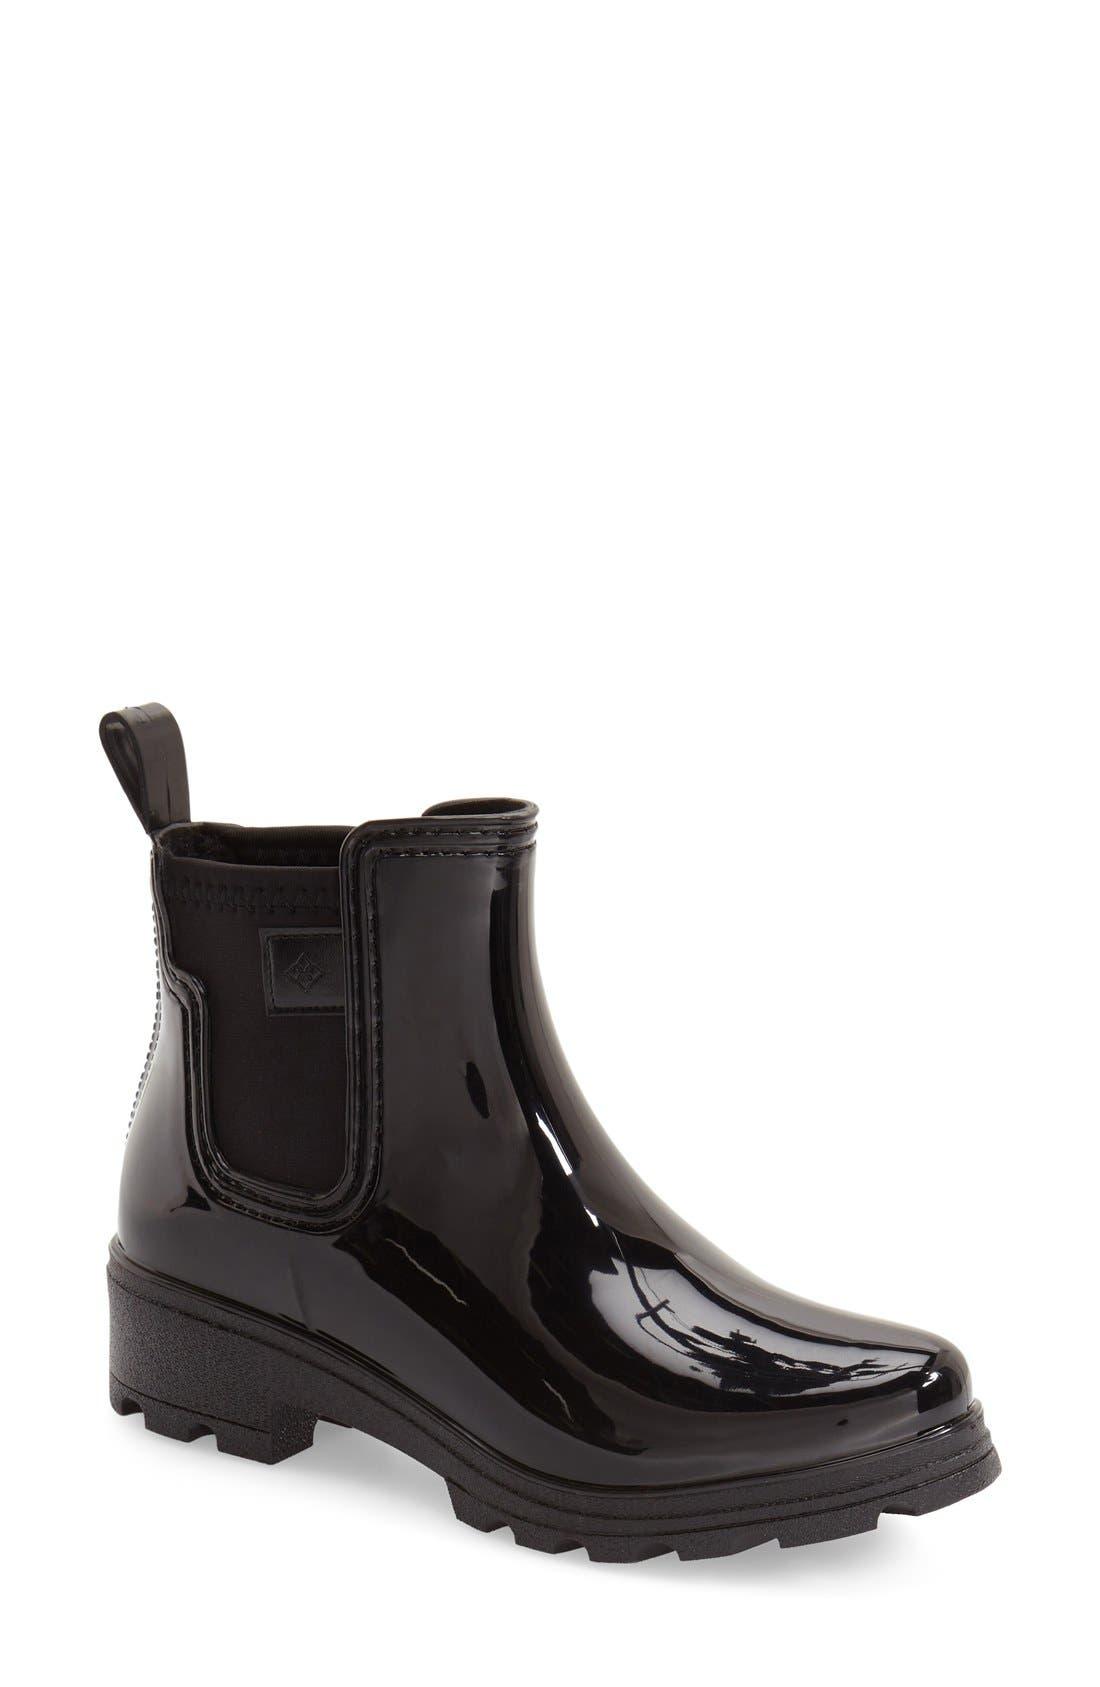 DÄV 'Prague' Waterproof Chelsea Rain Boot, Main, color, 001